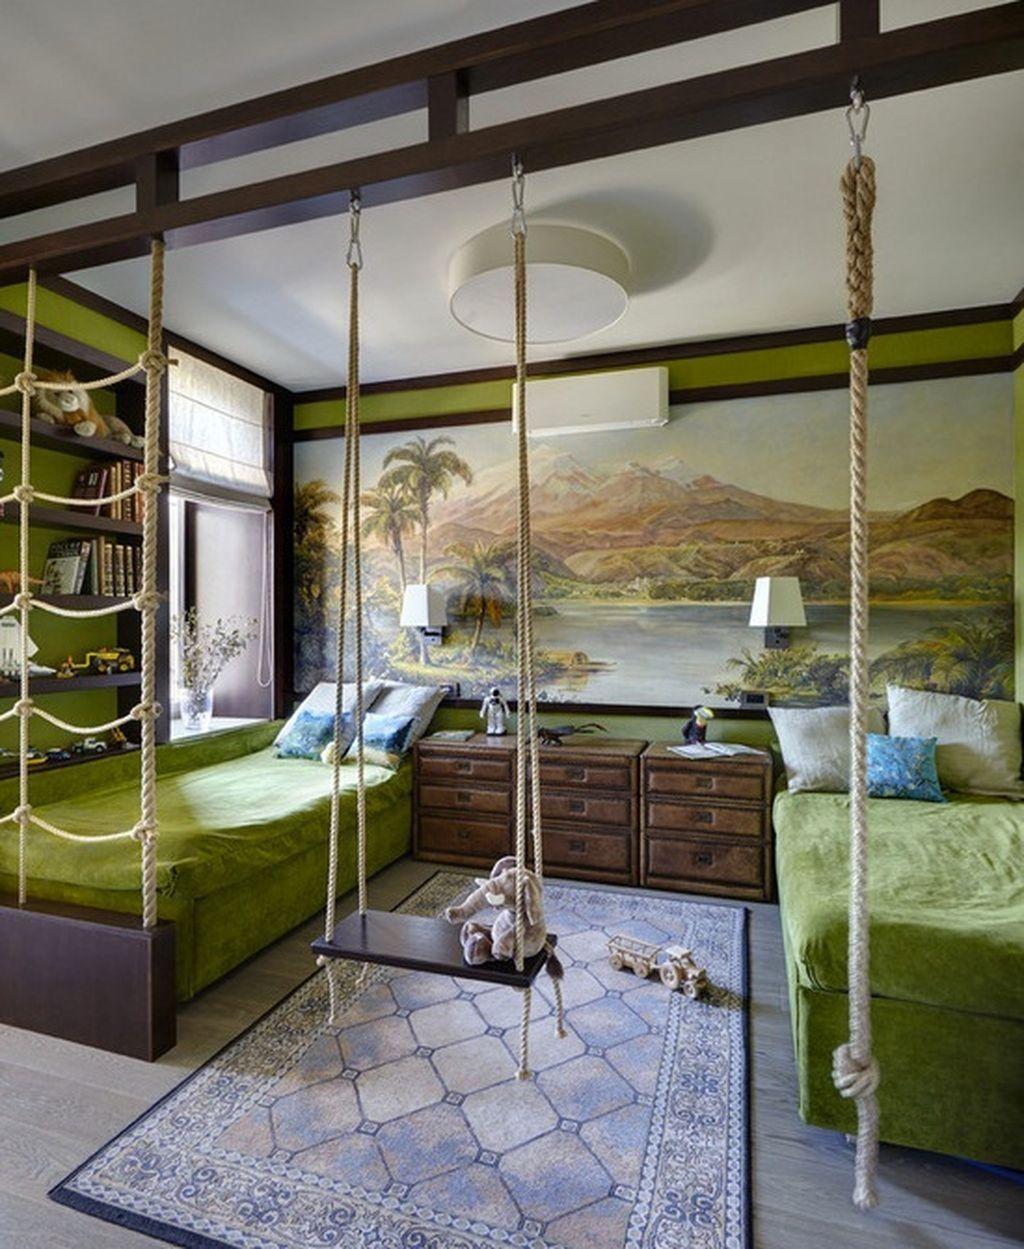 37 Superb Contemporary Interior Design Ideas For Kids Room – LUVLYDECORA